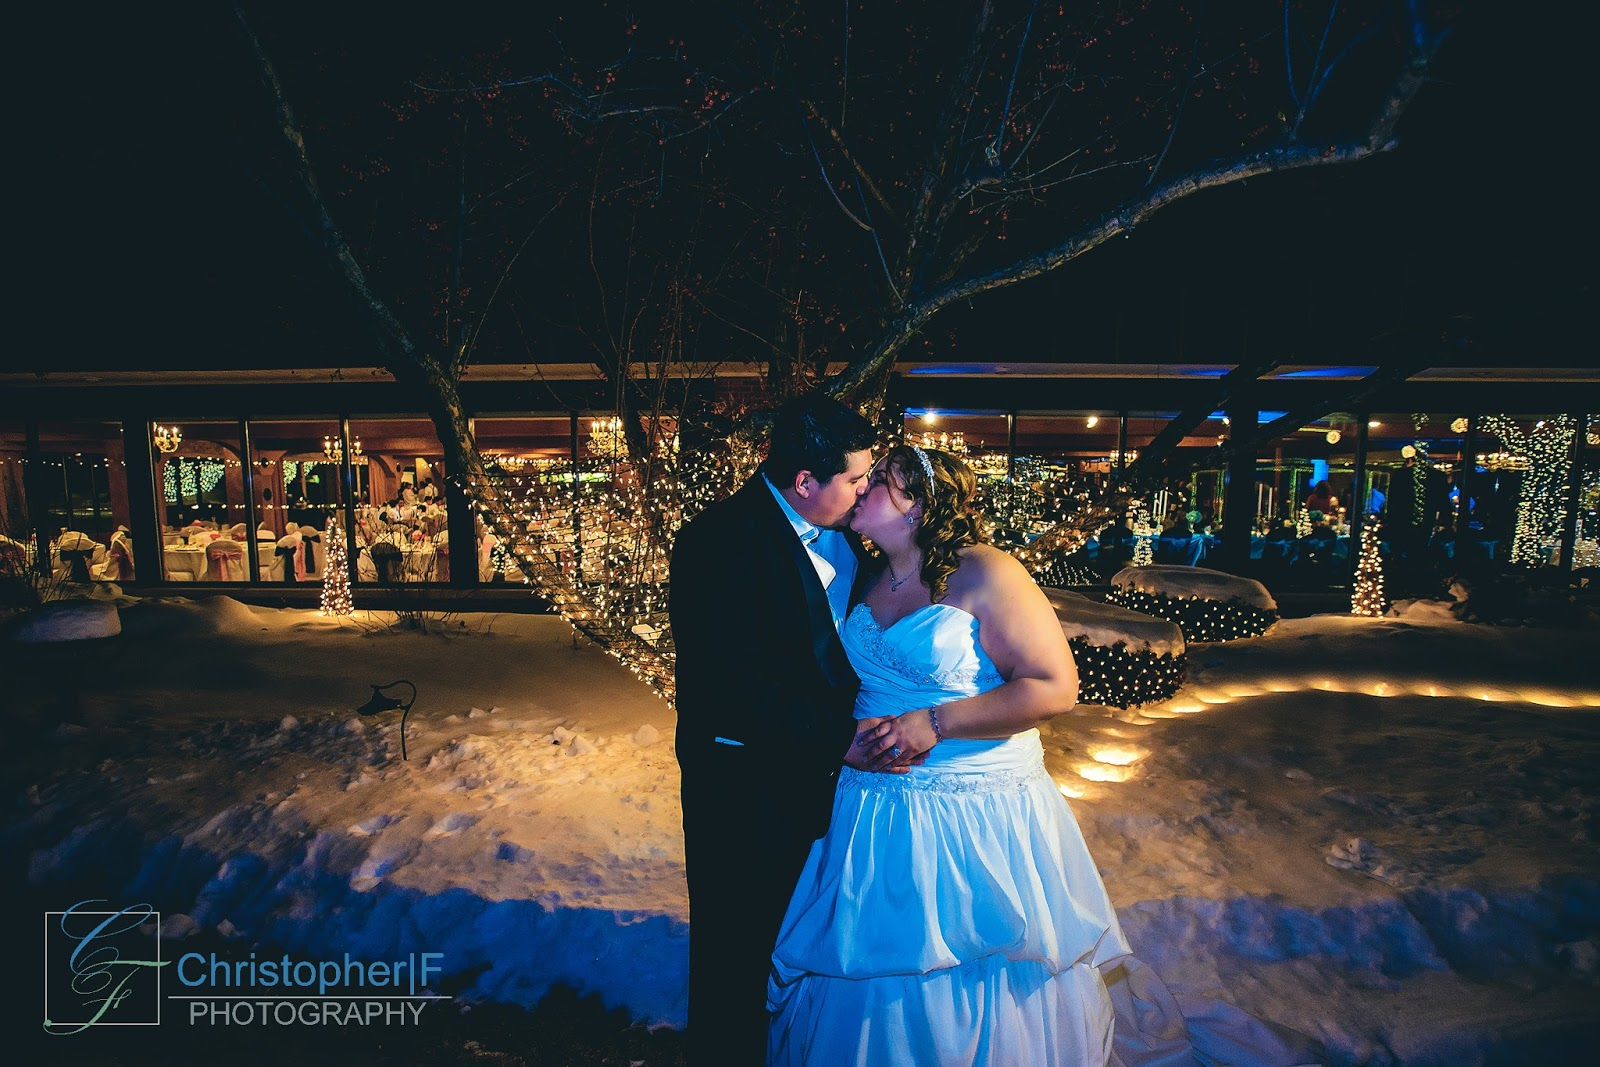 Night Wedding Photograph Chicago